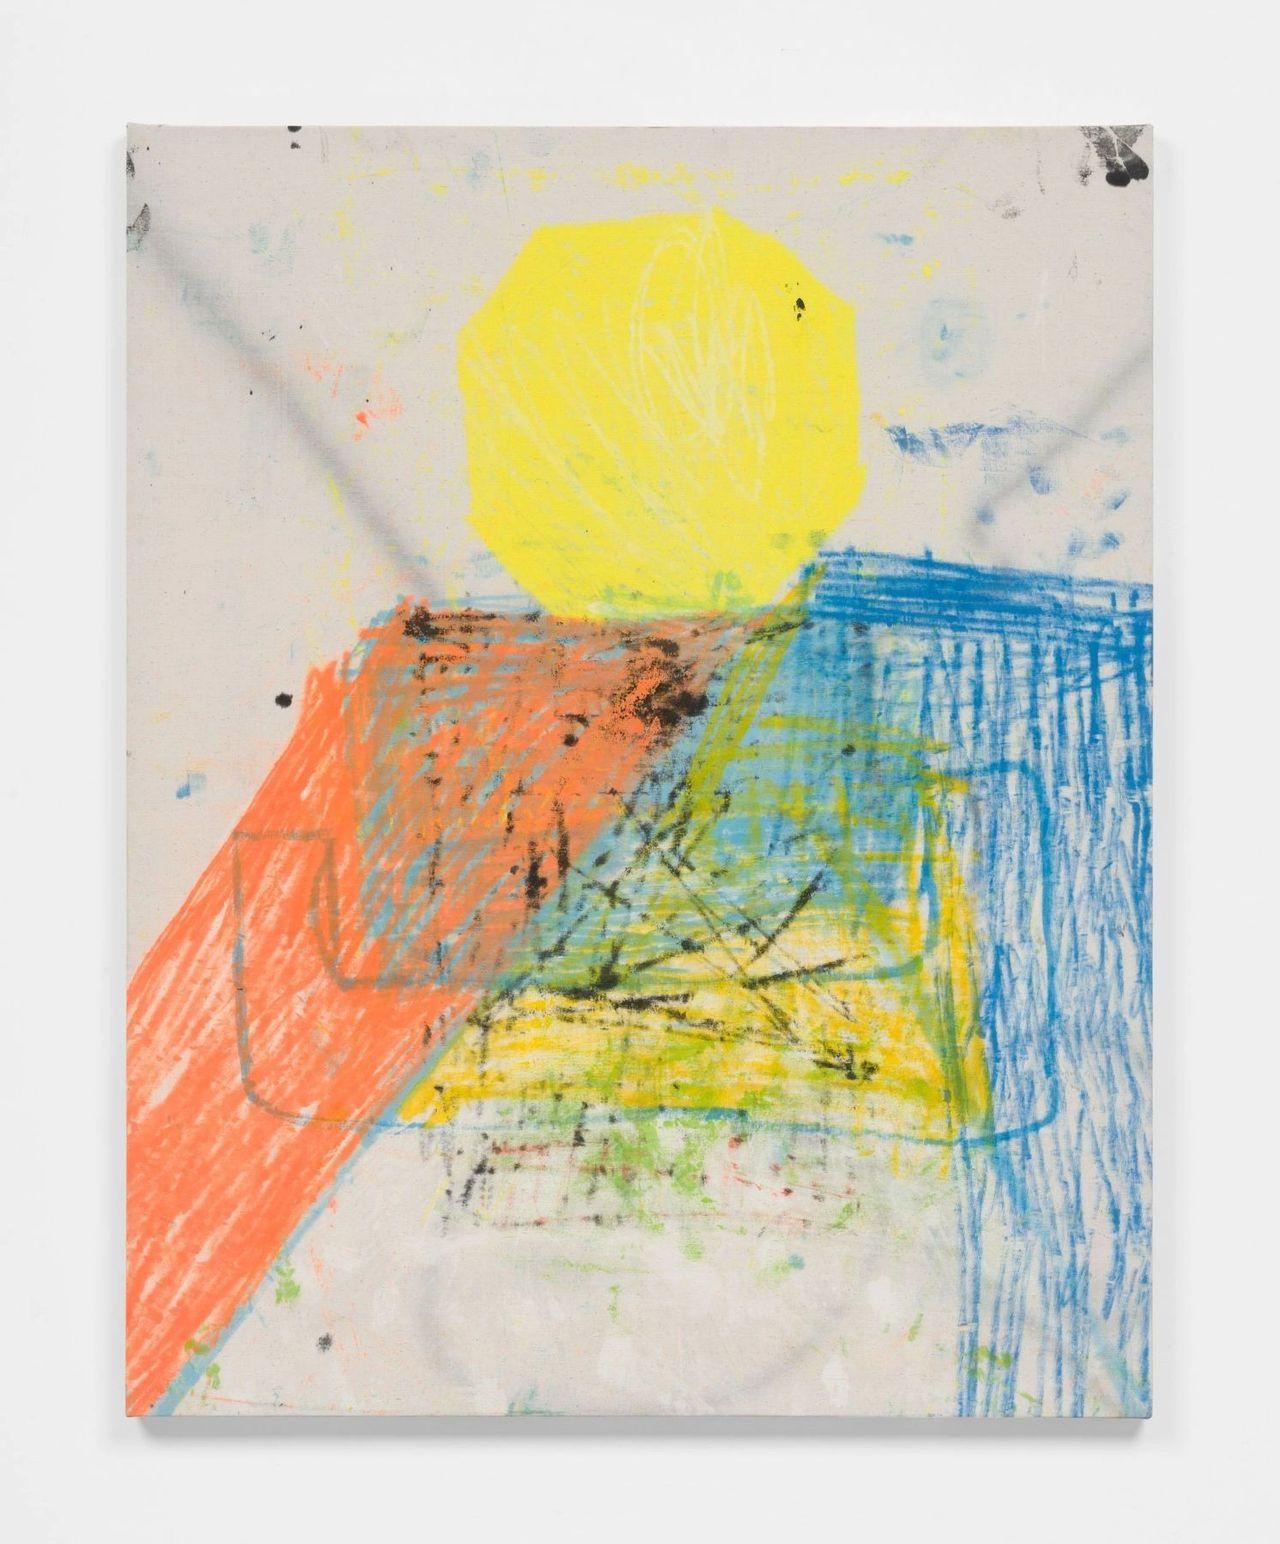 """Untitled Painting #102"" by Habib Farajabadi"